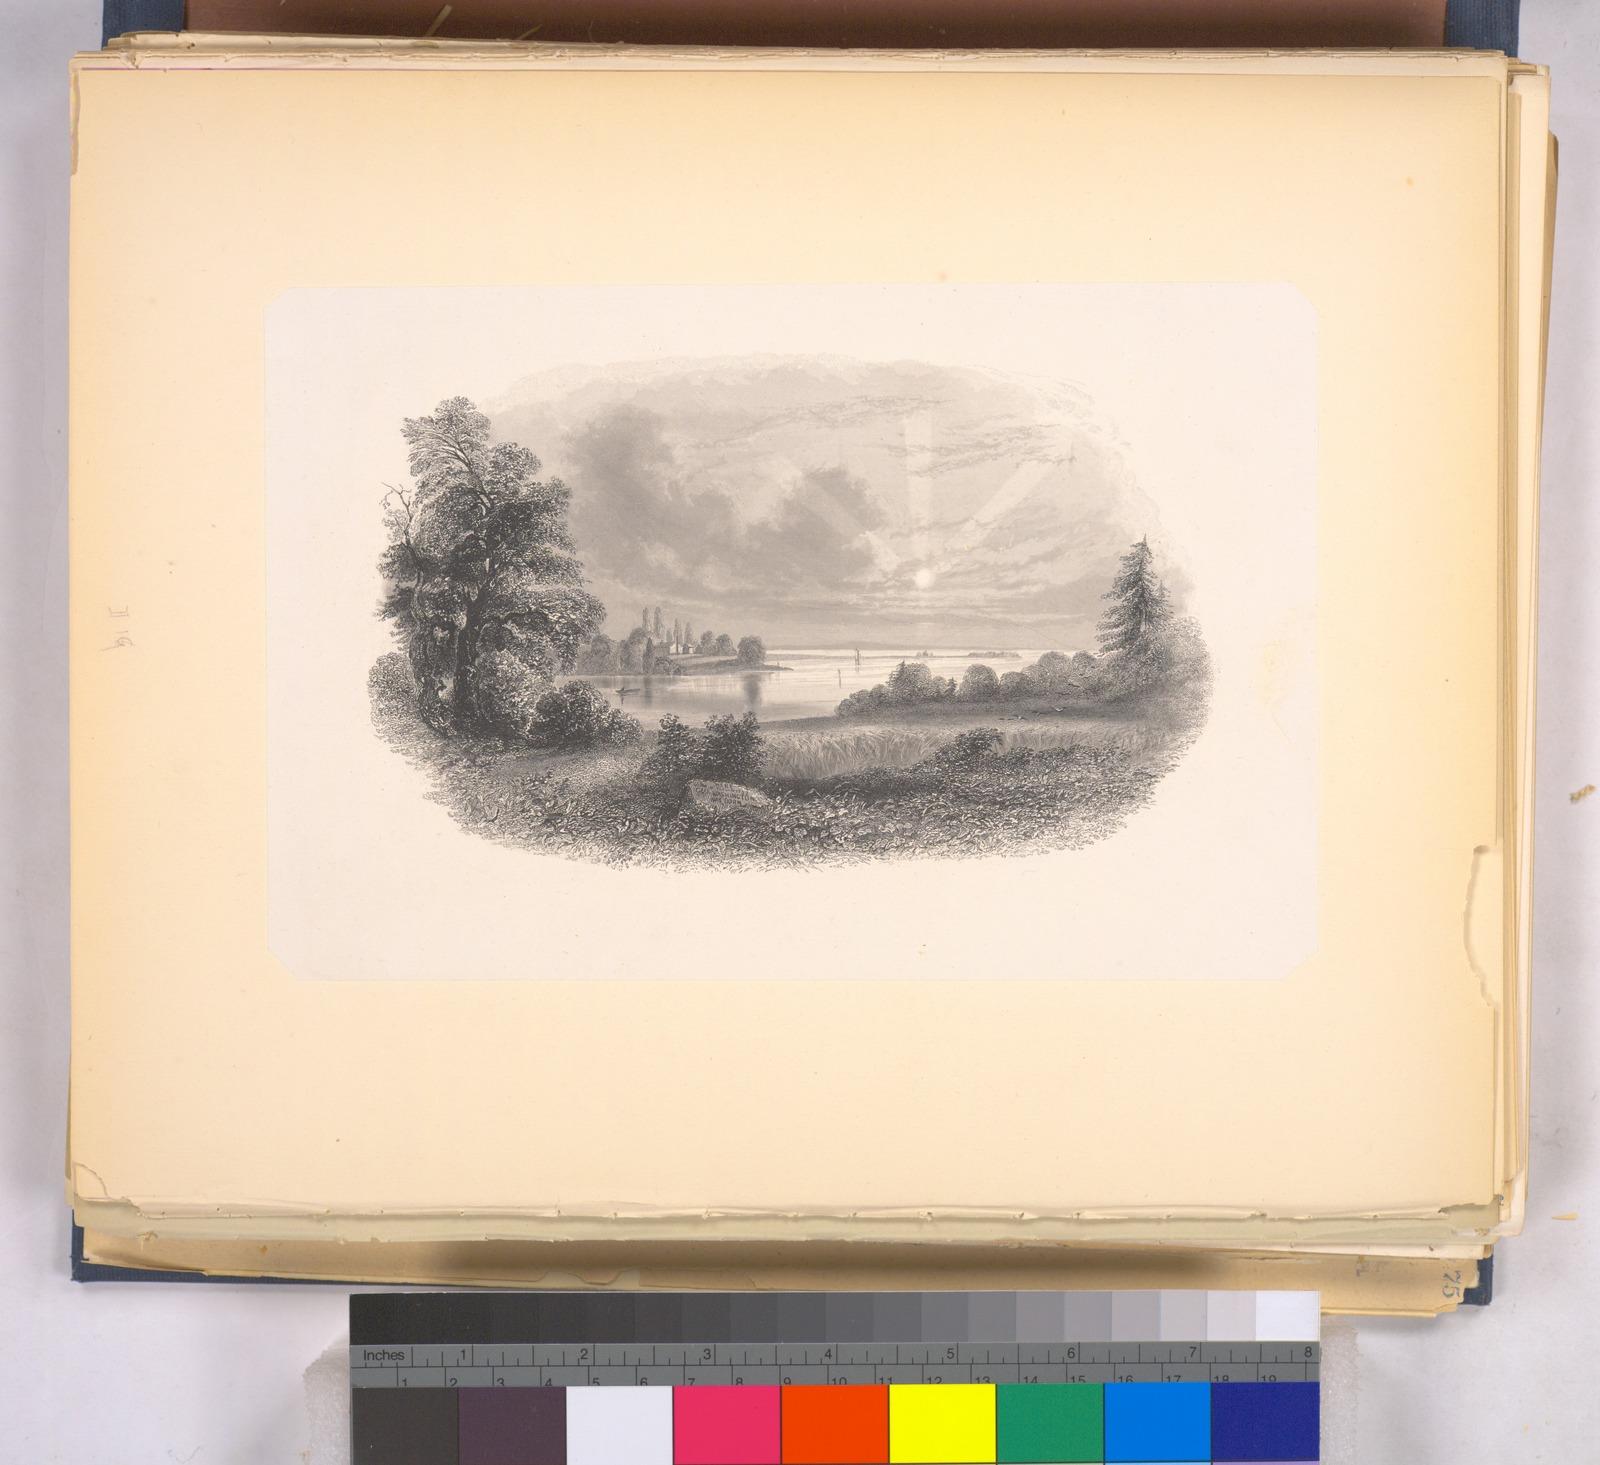 Site of Washington's birth place.